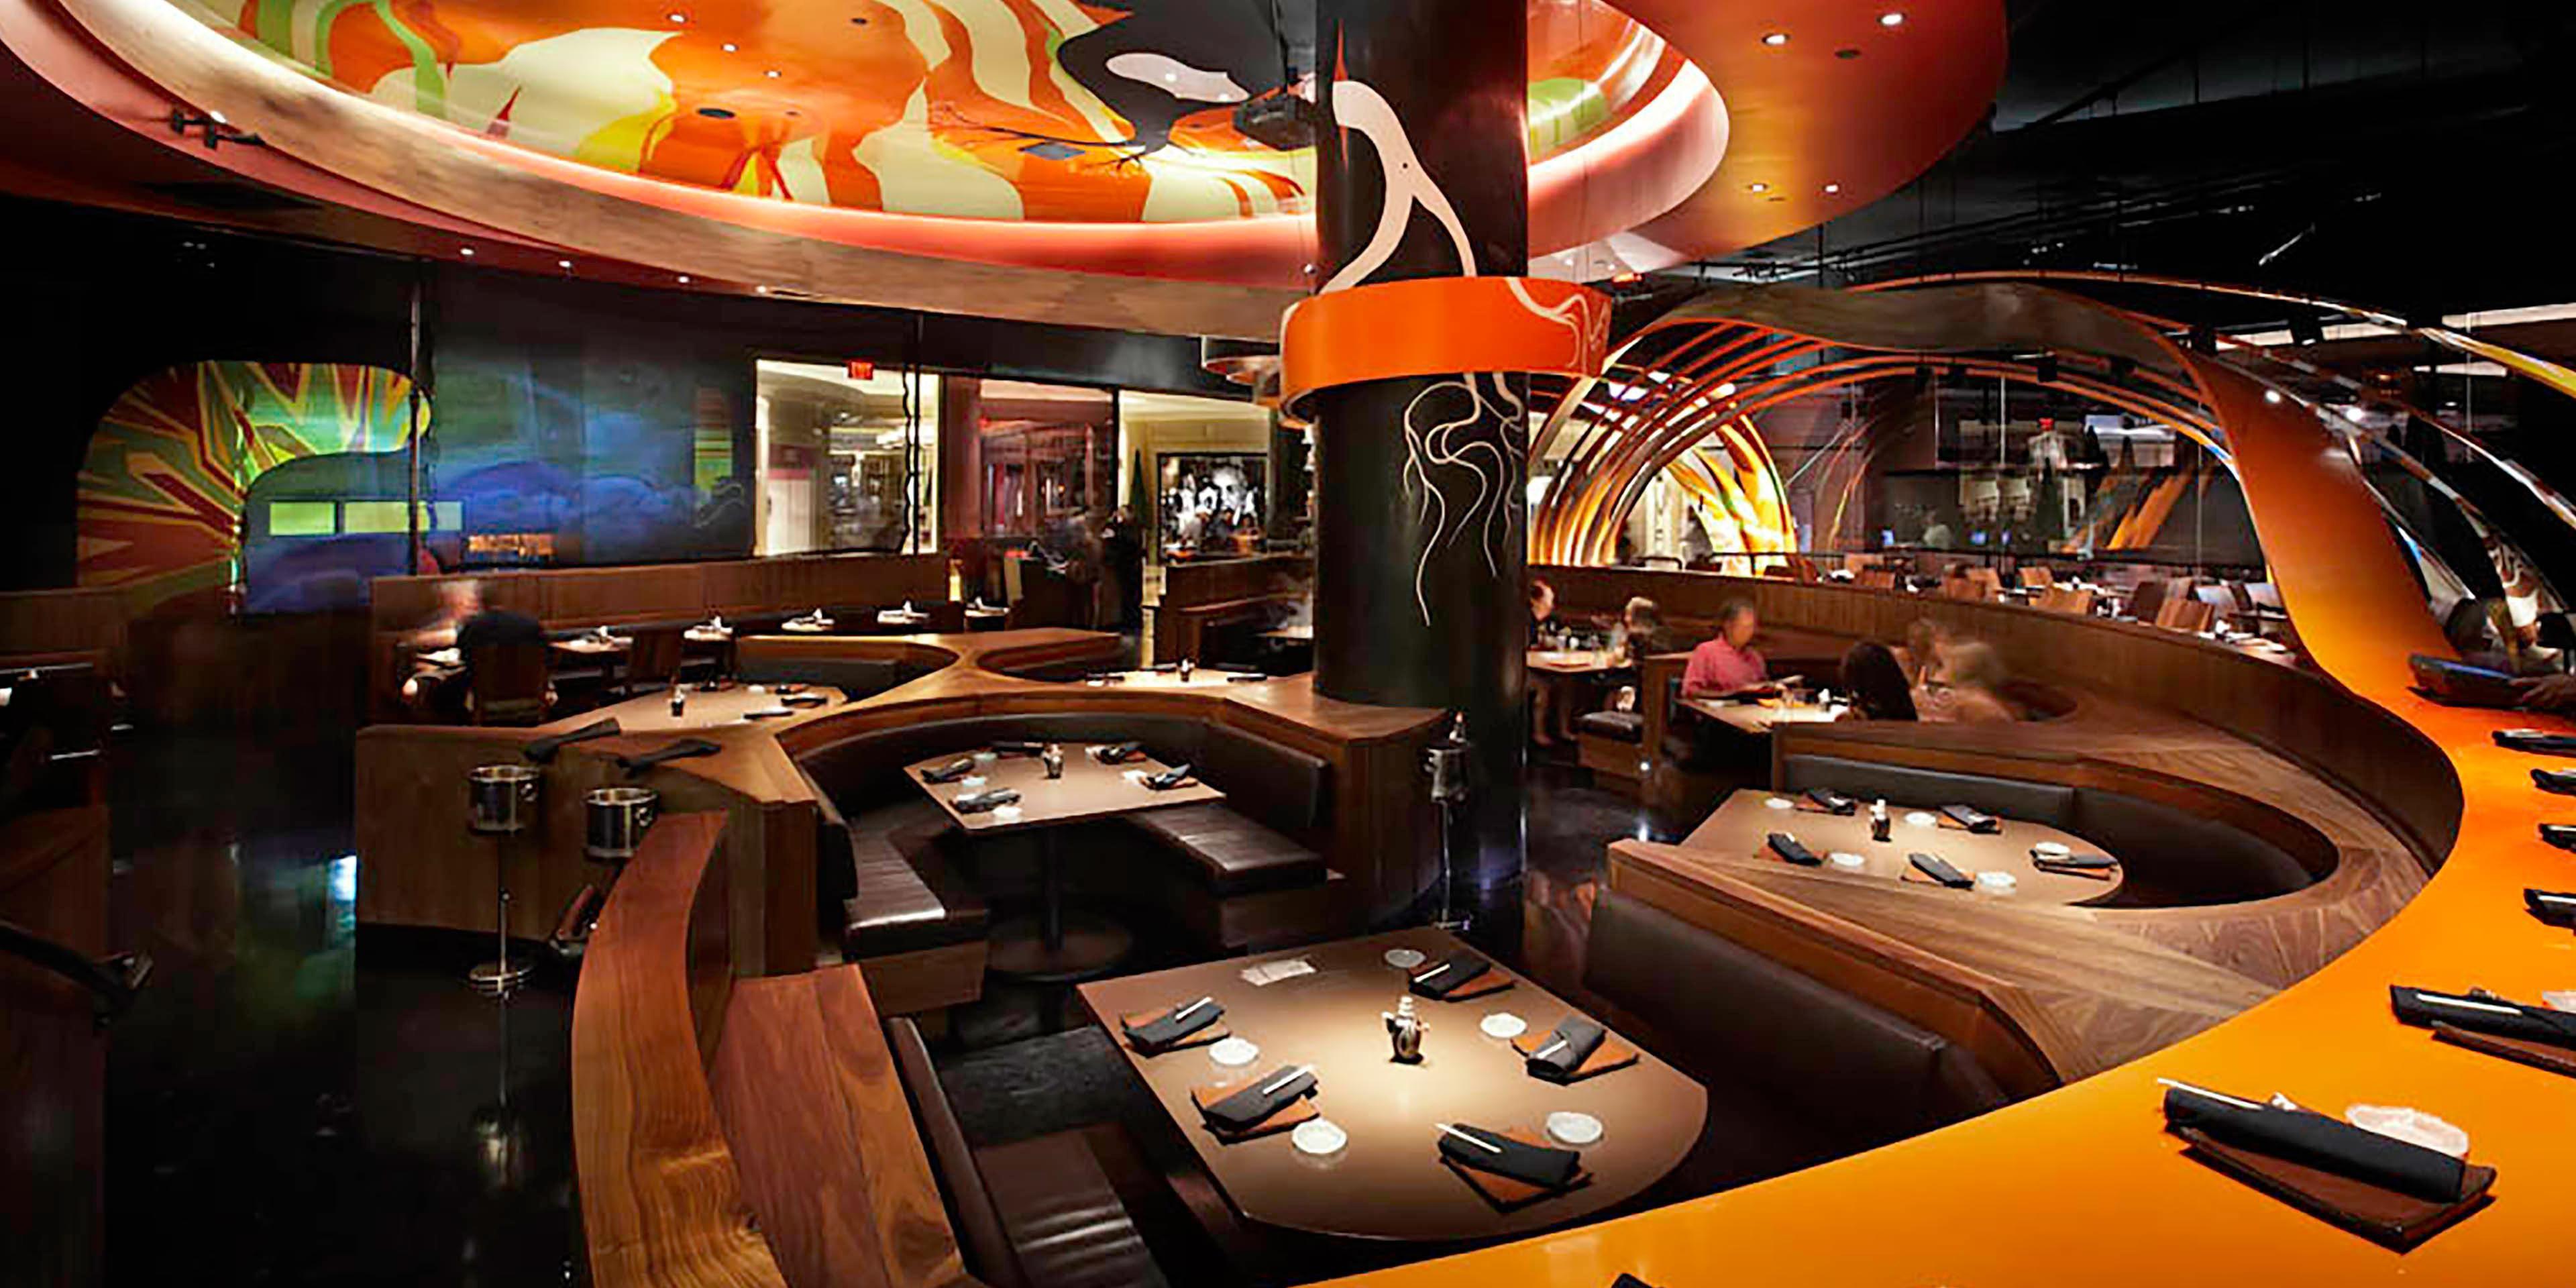 Ic Alliance Resorts Las Vegas 4770852538 2x1 Interior